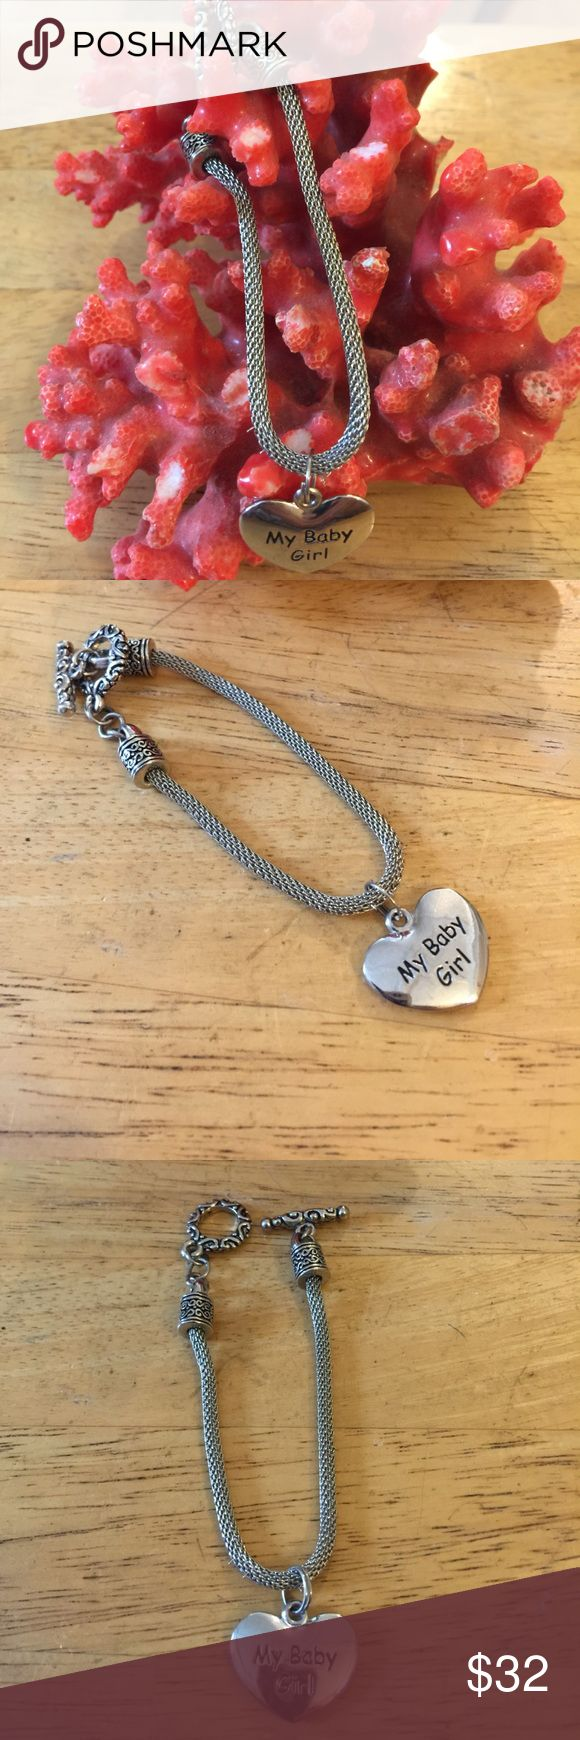 My baby girl mesh bracelet Gorgeous in silver plated mesh bracelet Jewelry Bracelets